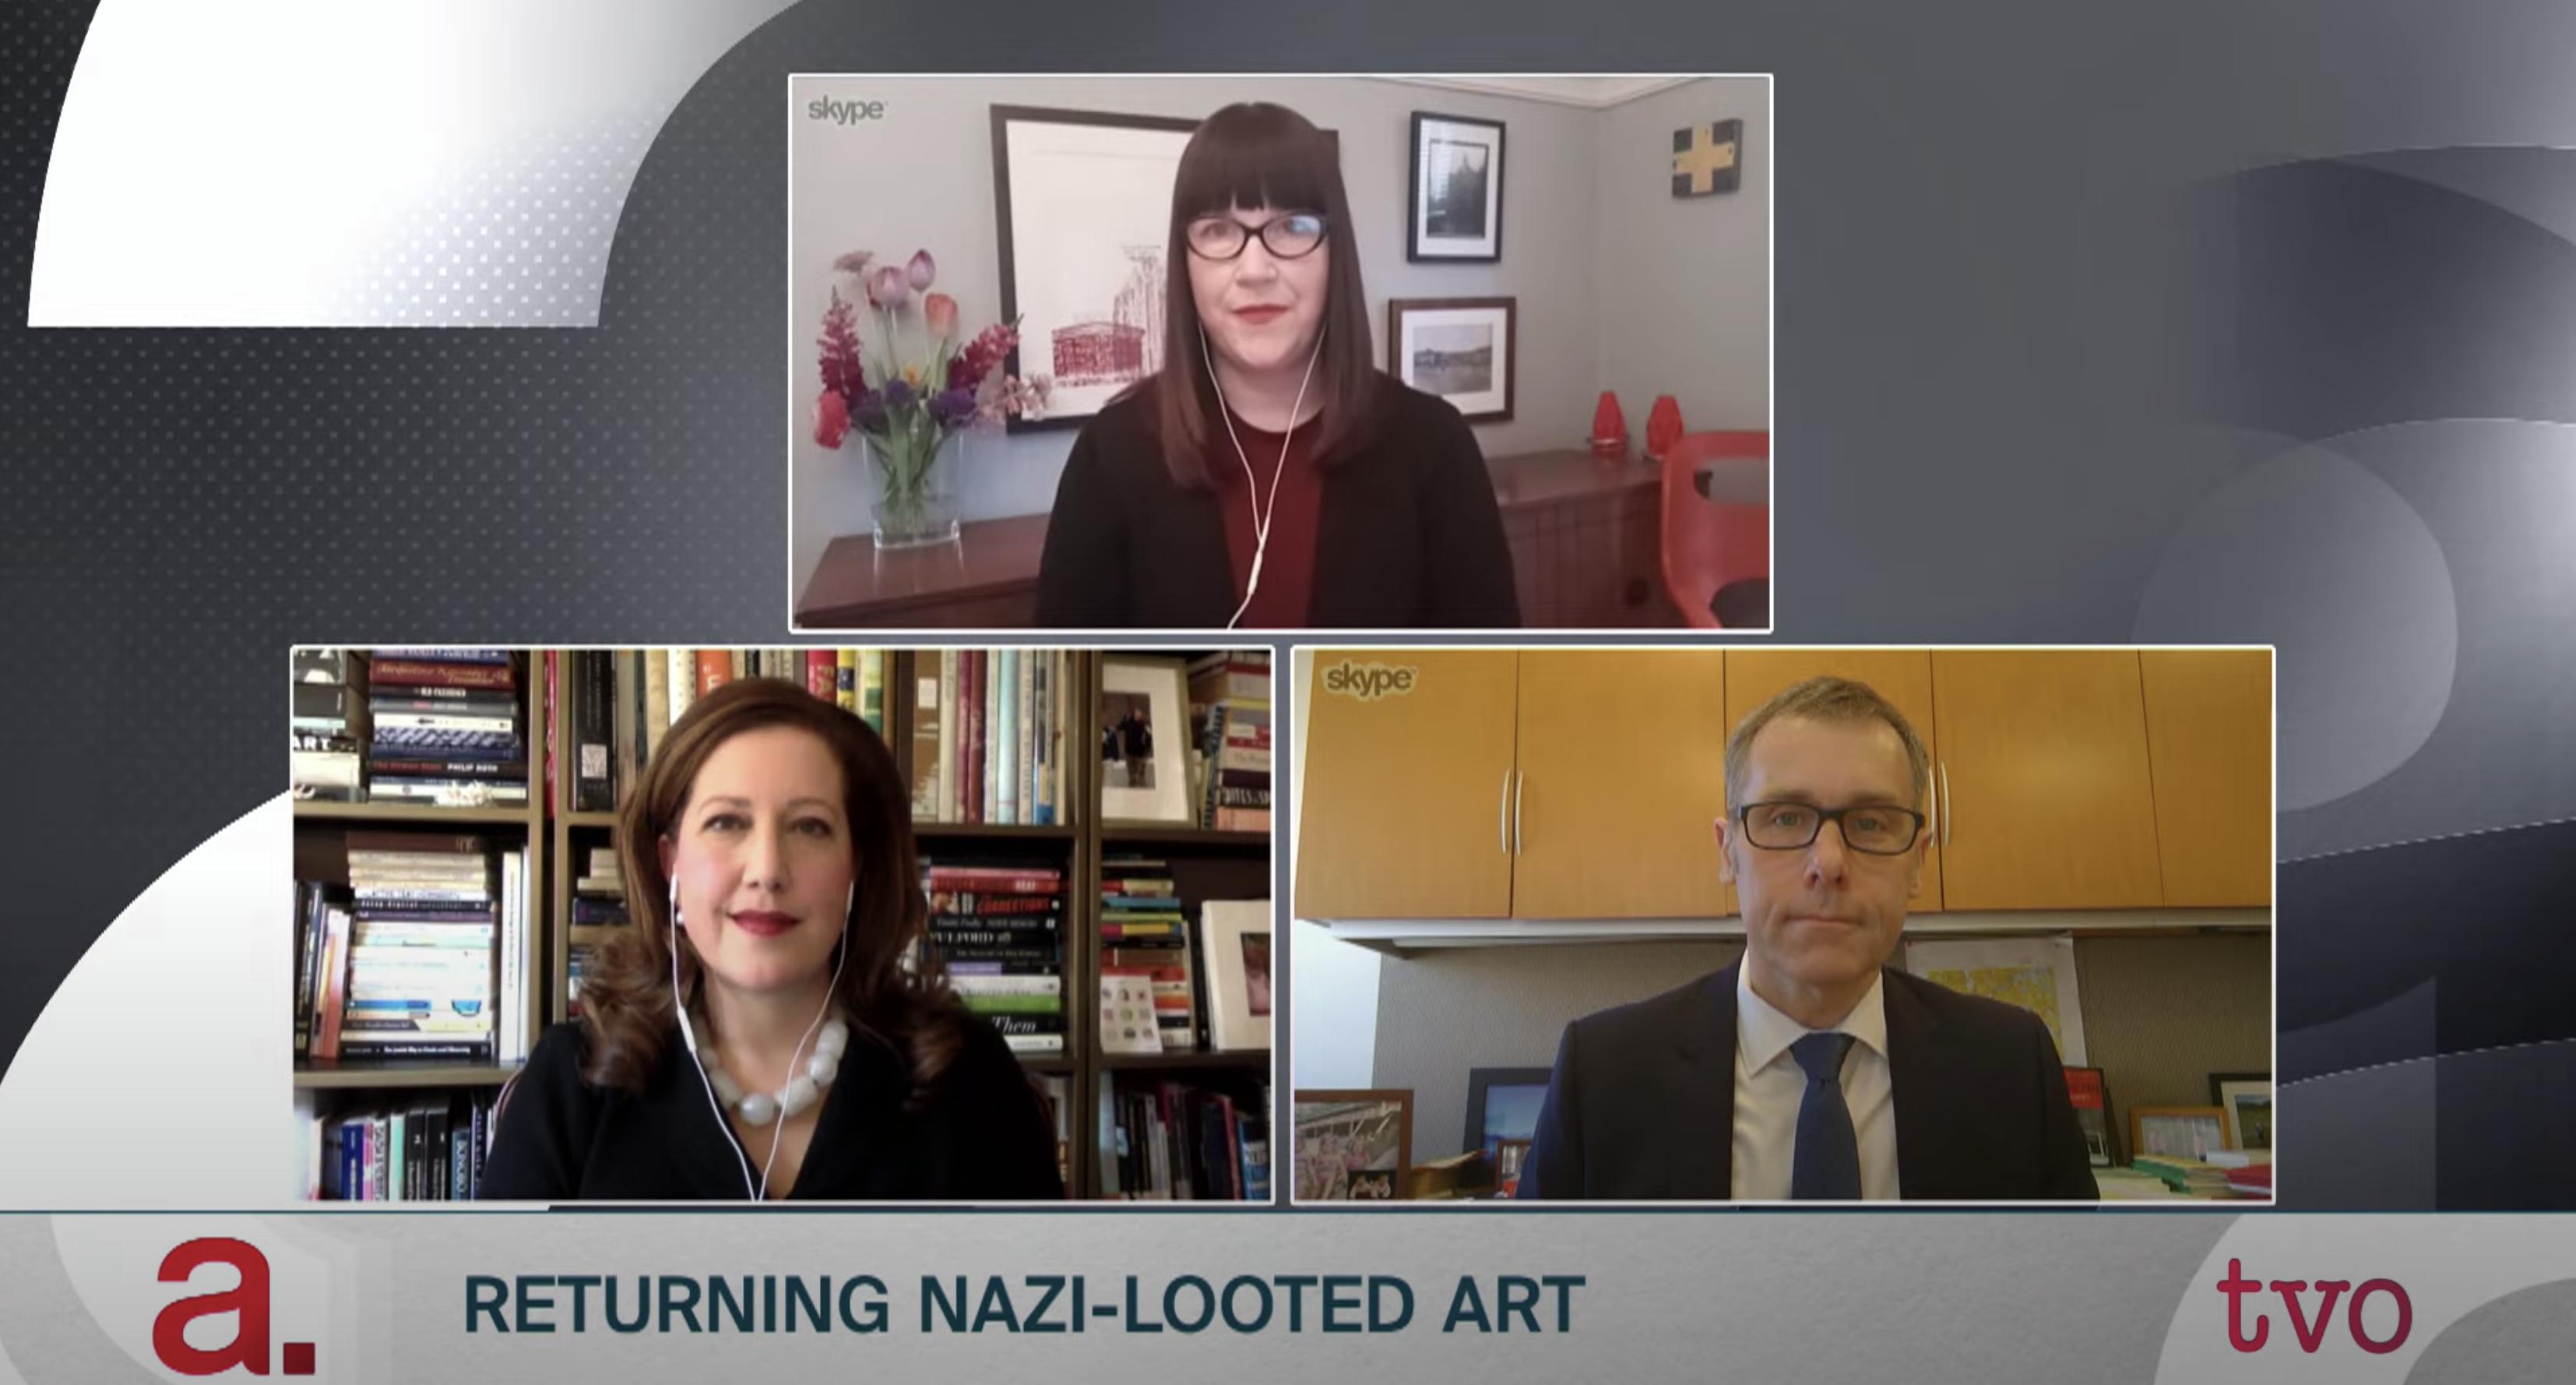 Sara-Angel-The-Agenda-with-Steve-Paikin-Returning-Nazi-Looted-Art-Panelists